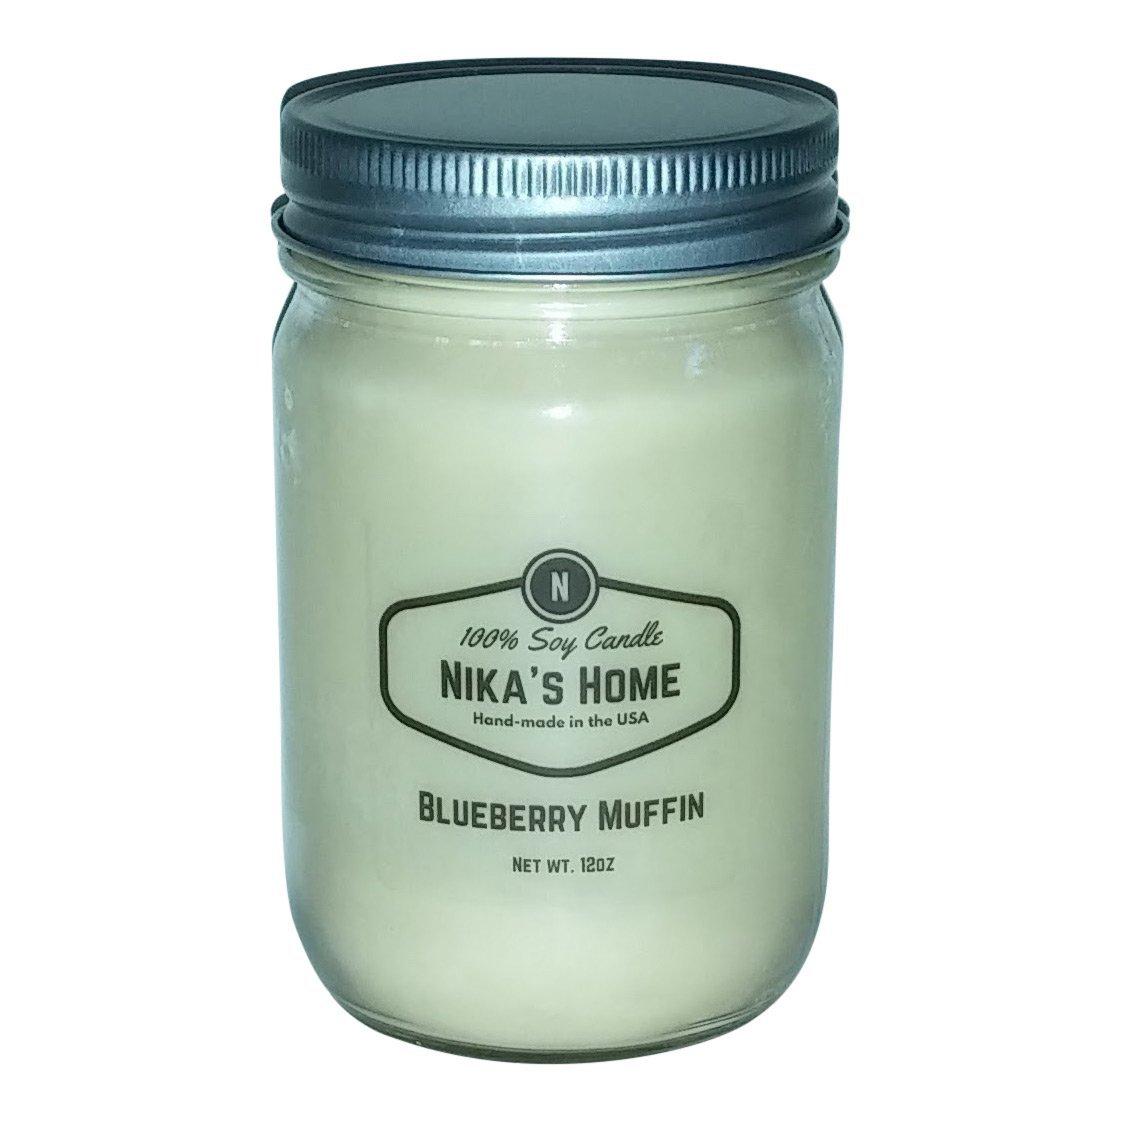 Nika's Home Blueberry Muffin Soy Candle - 12oz Mason Jar